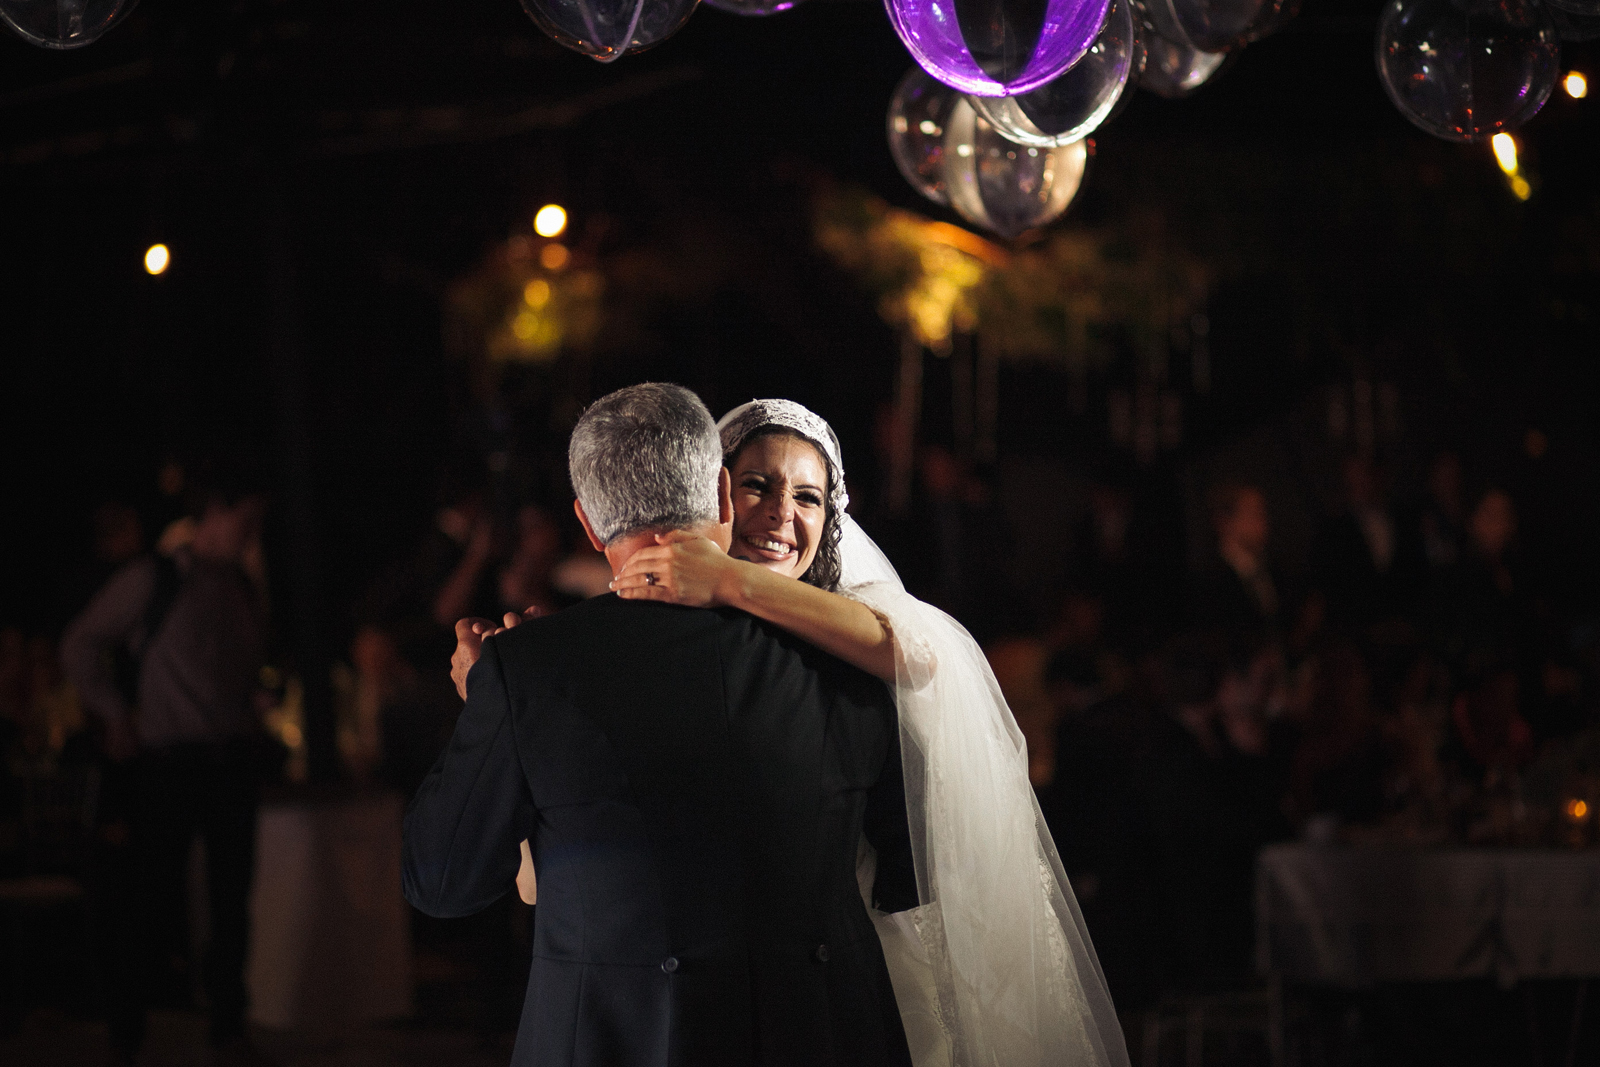 award_winning_wedding_photographer_007.jpg